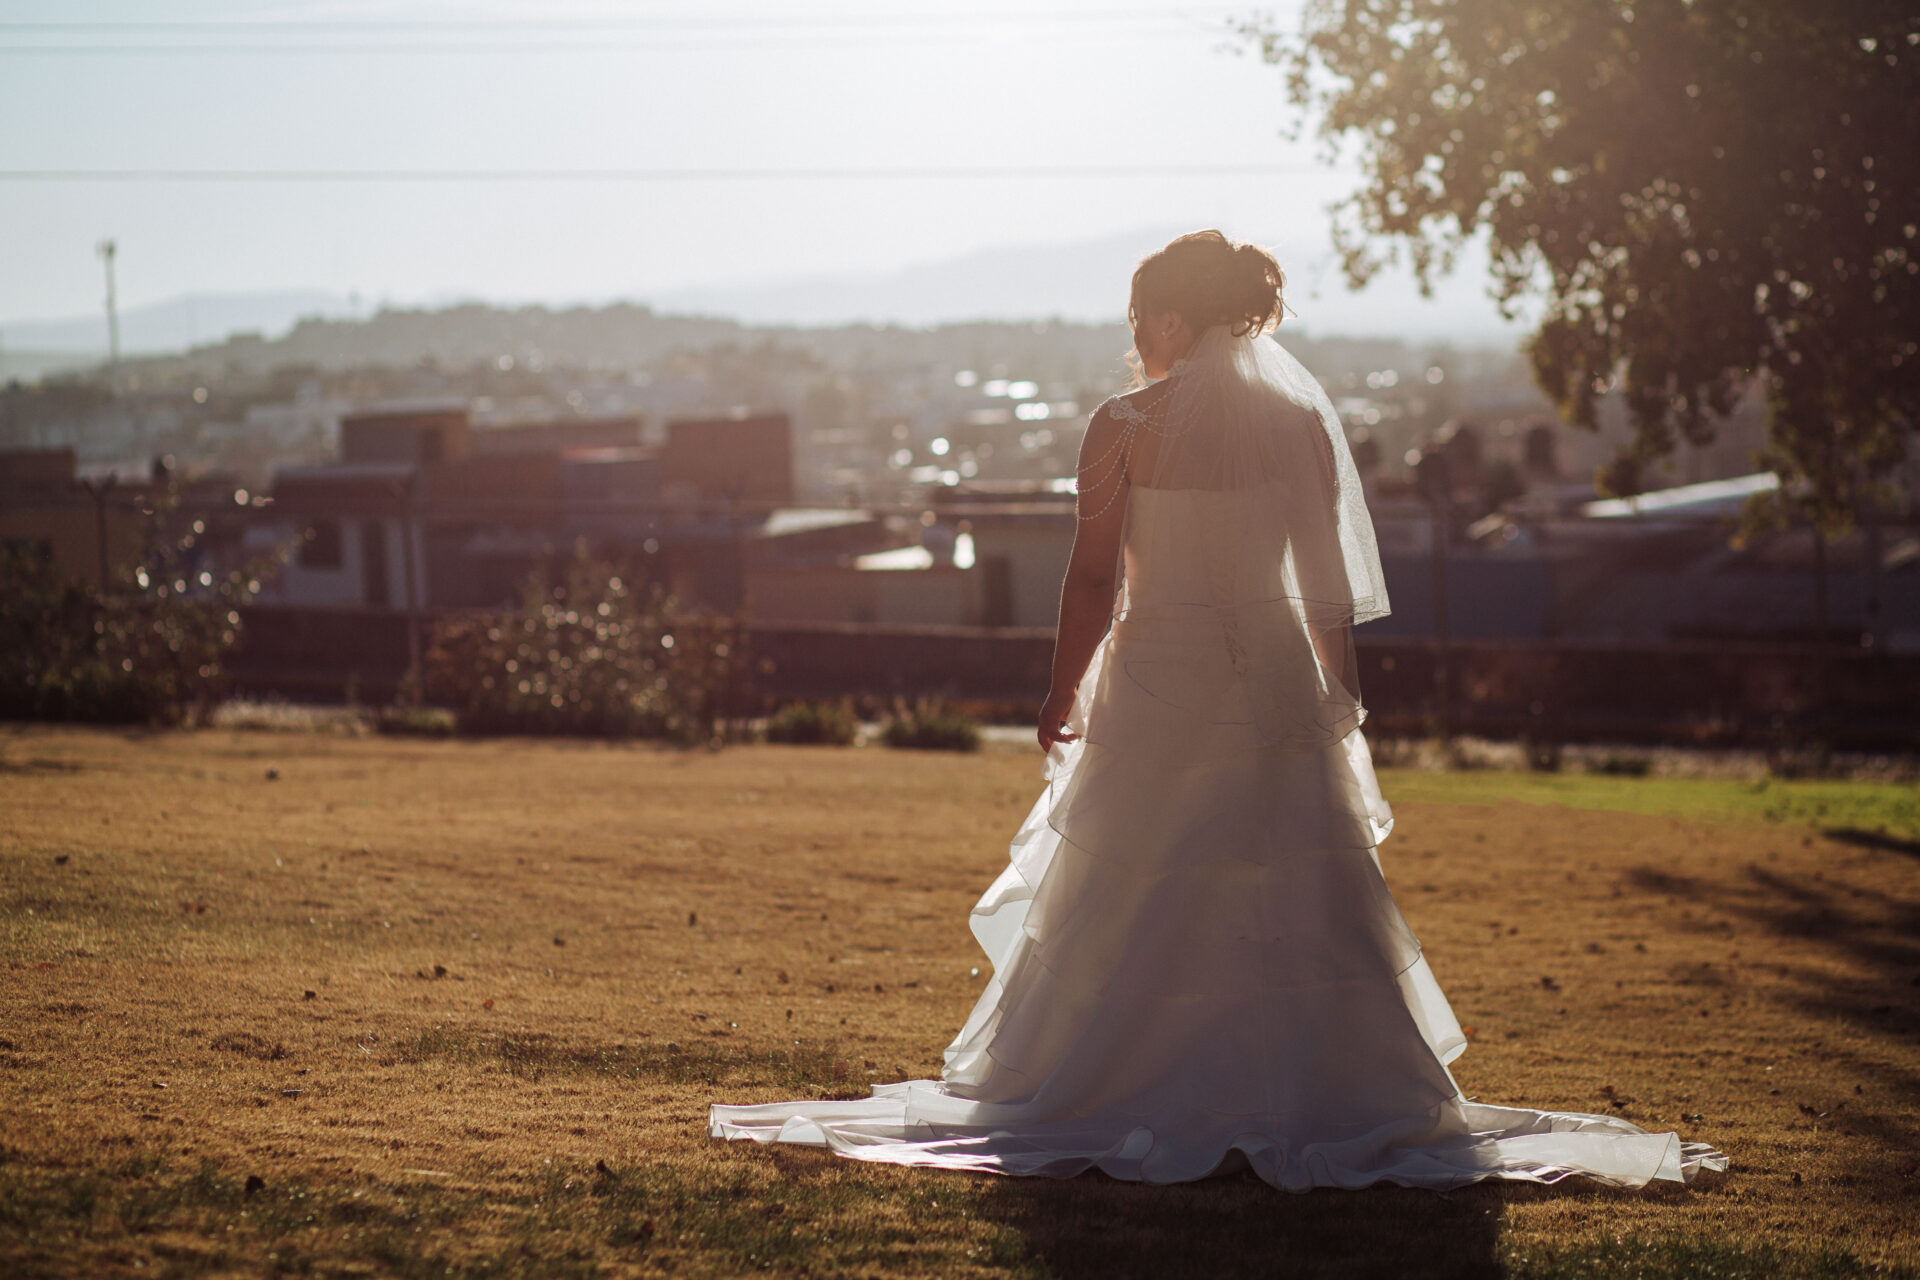 javier_noriega_fotografo_bodas_gaviones_zacatecas_wedding_photographer14